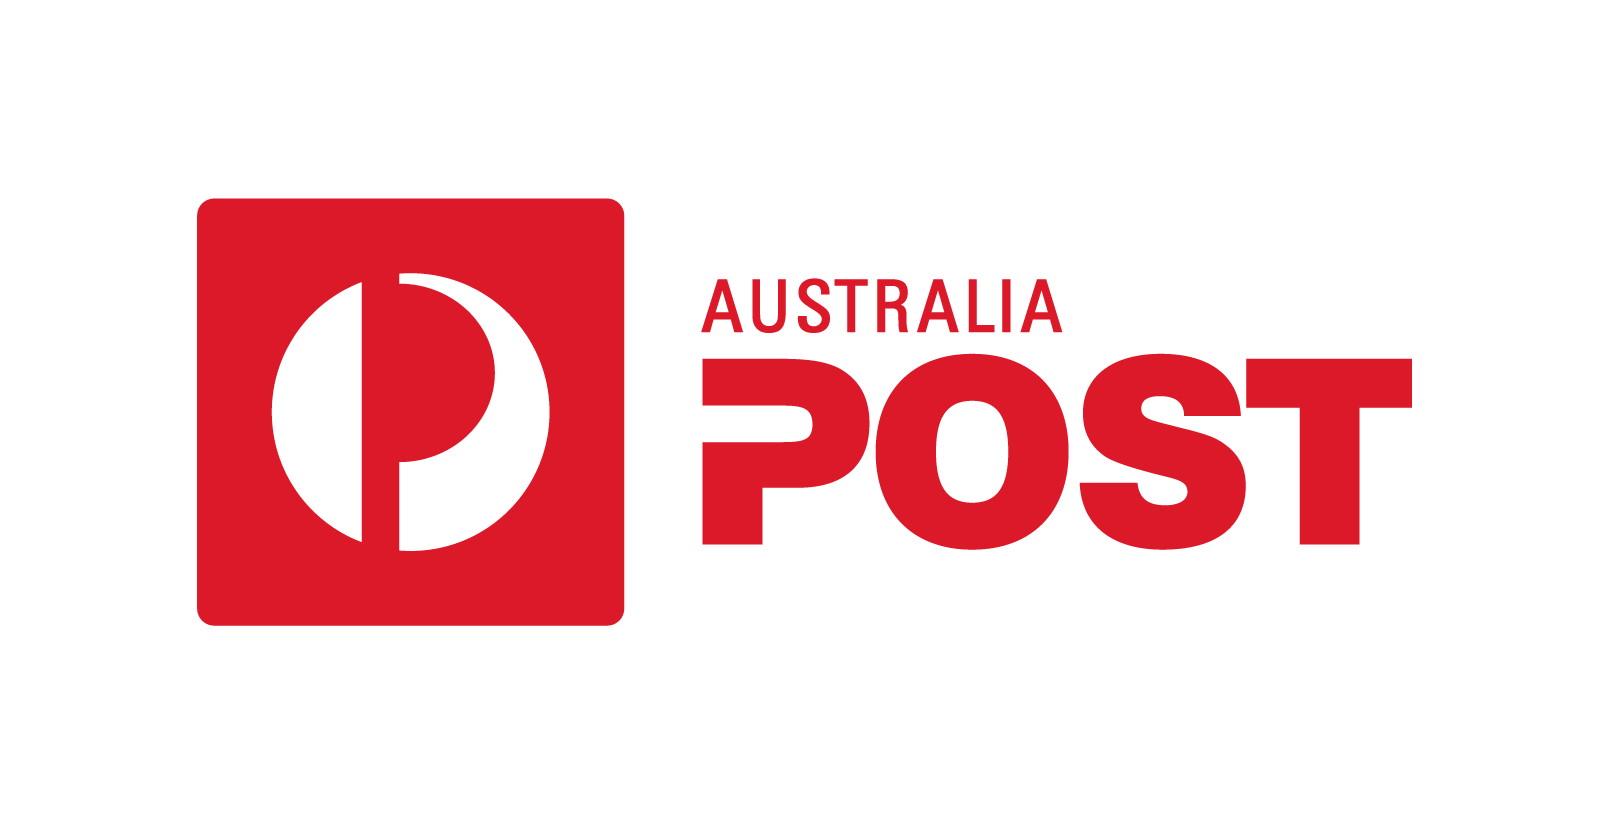 Australia Post Pet Insurance